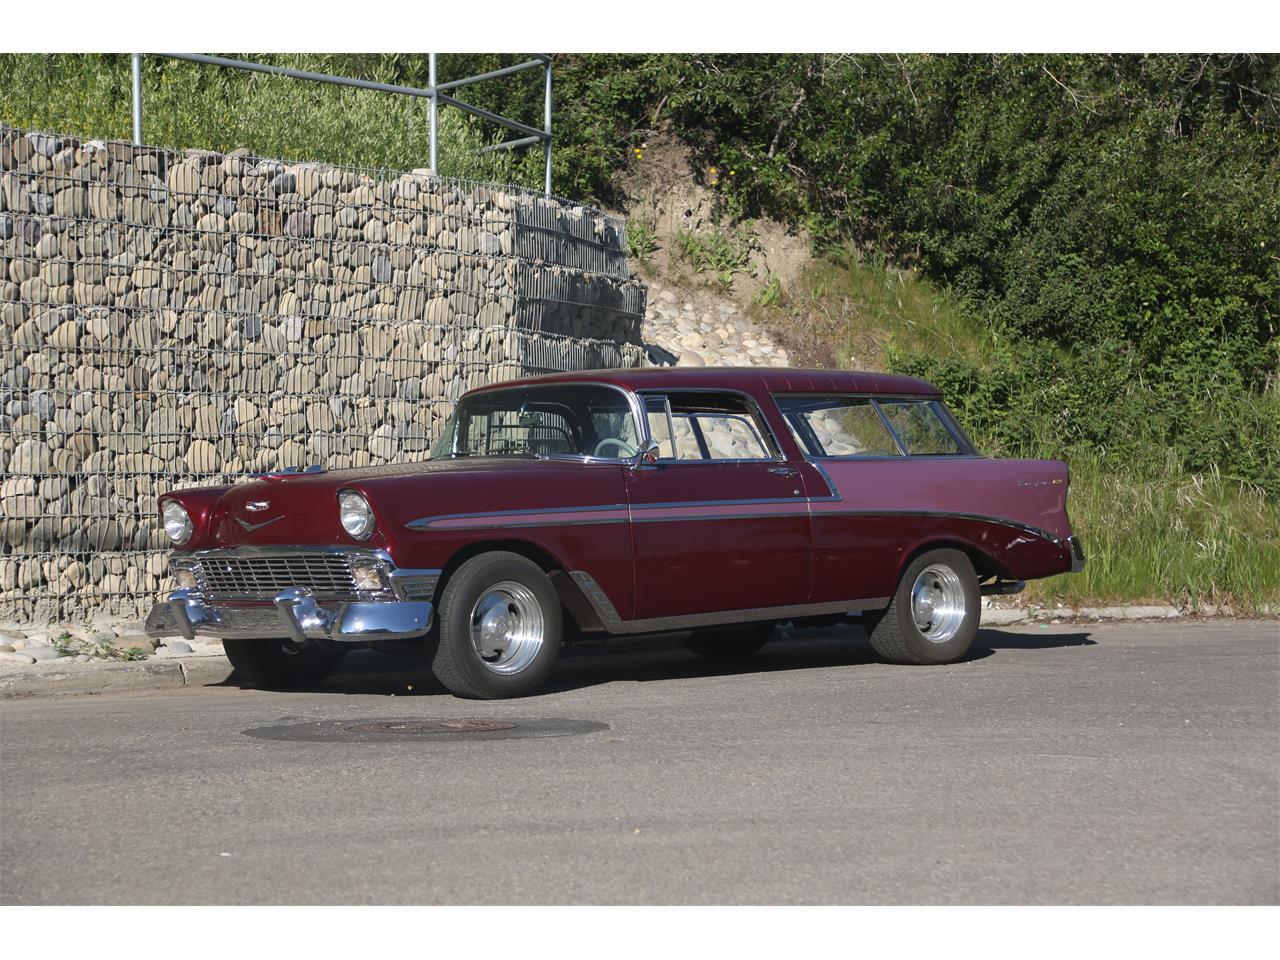 1956 Chevrolet Nomad for Sale | ClassicCars.com | CC-1088346